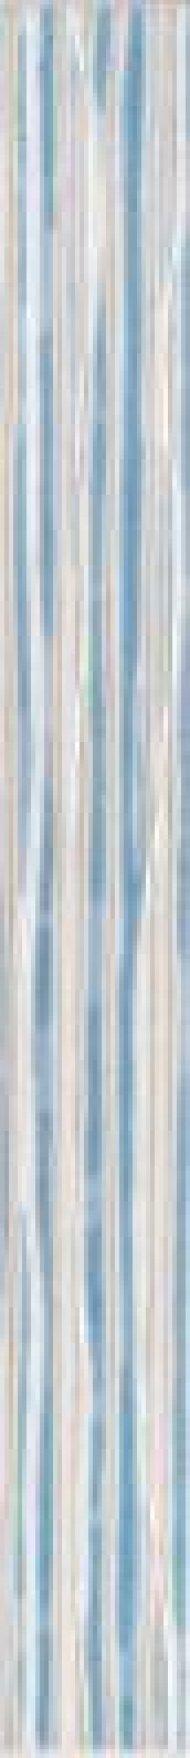 wlamh003-tulip-modra-listela.jpg